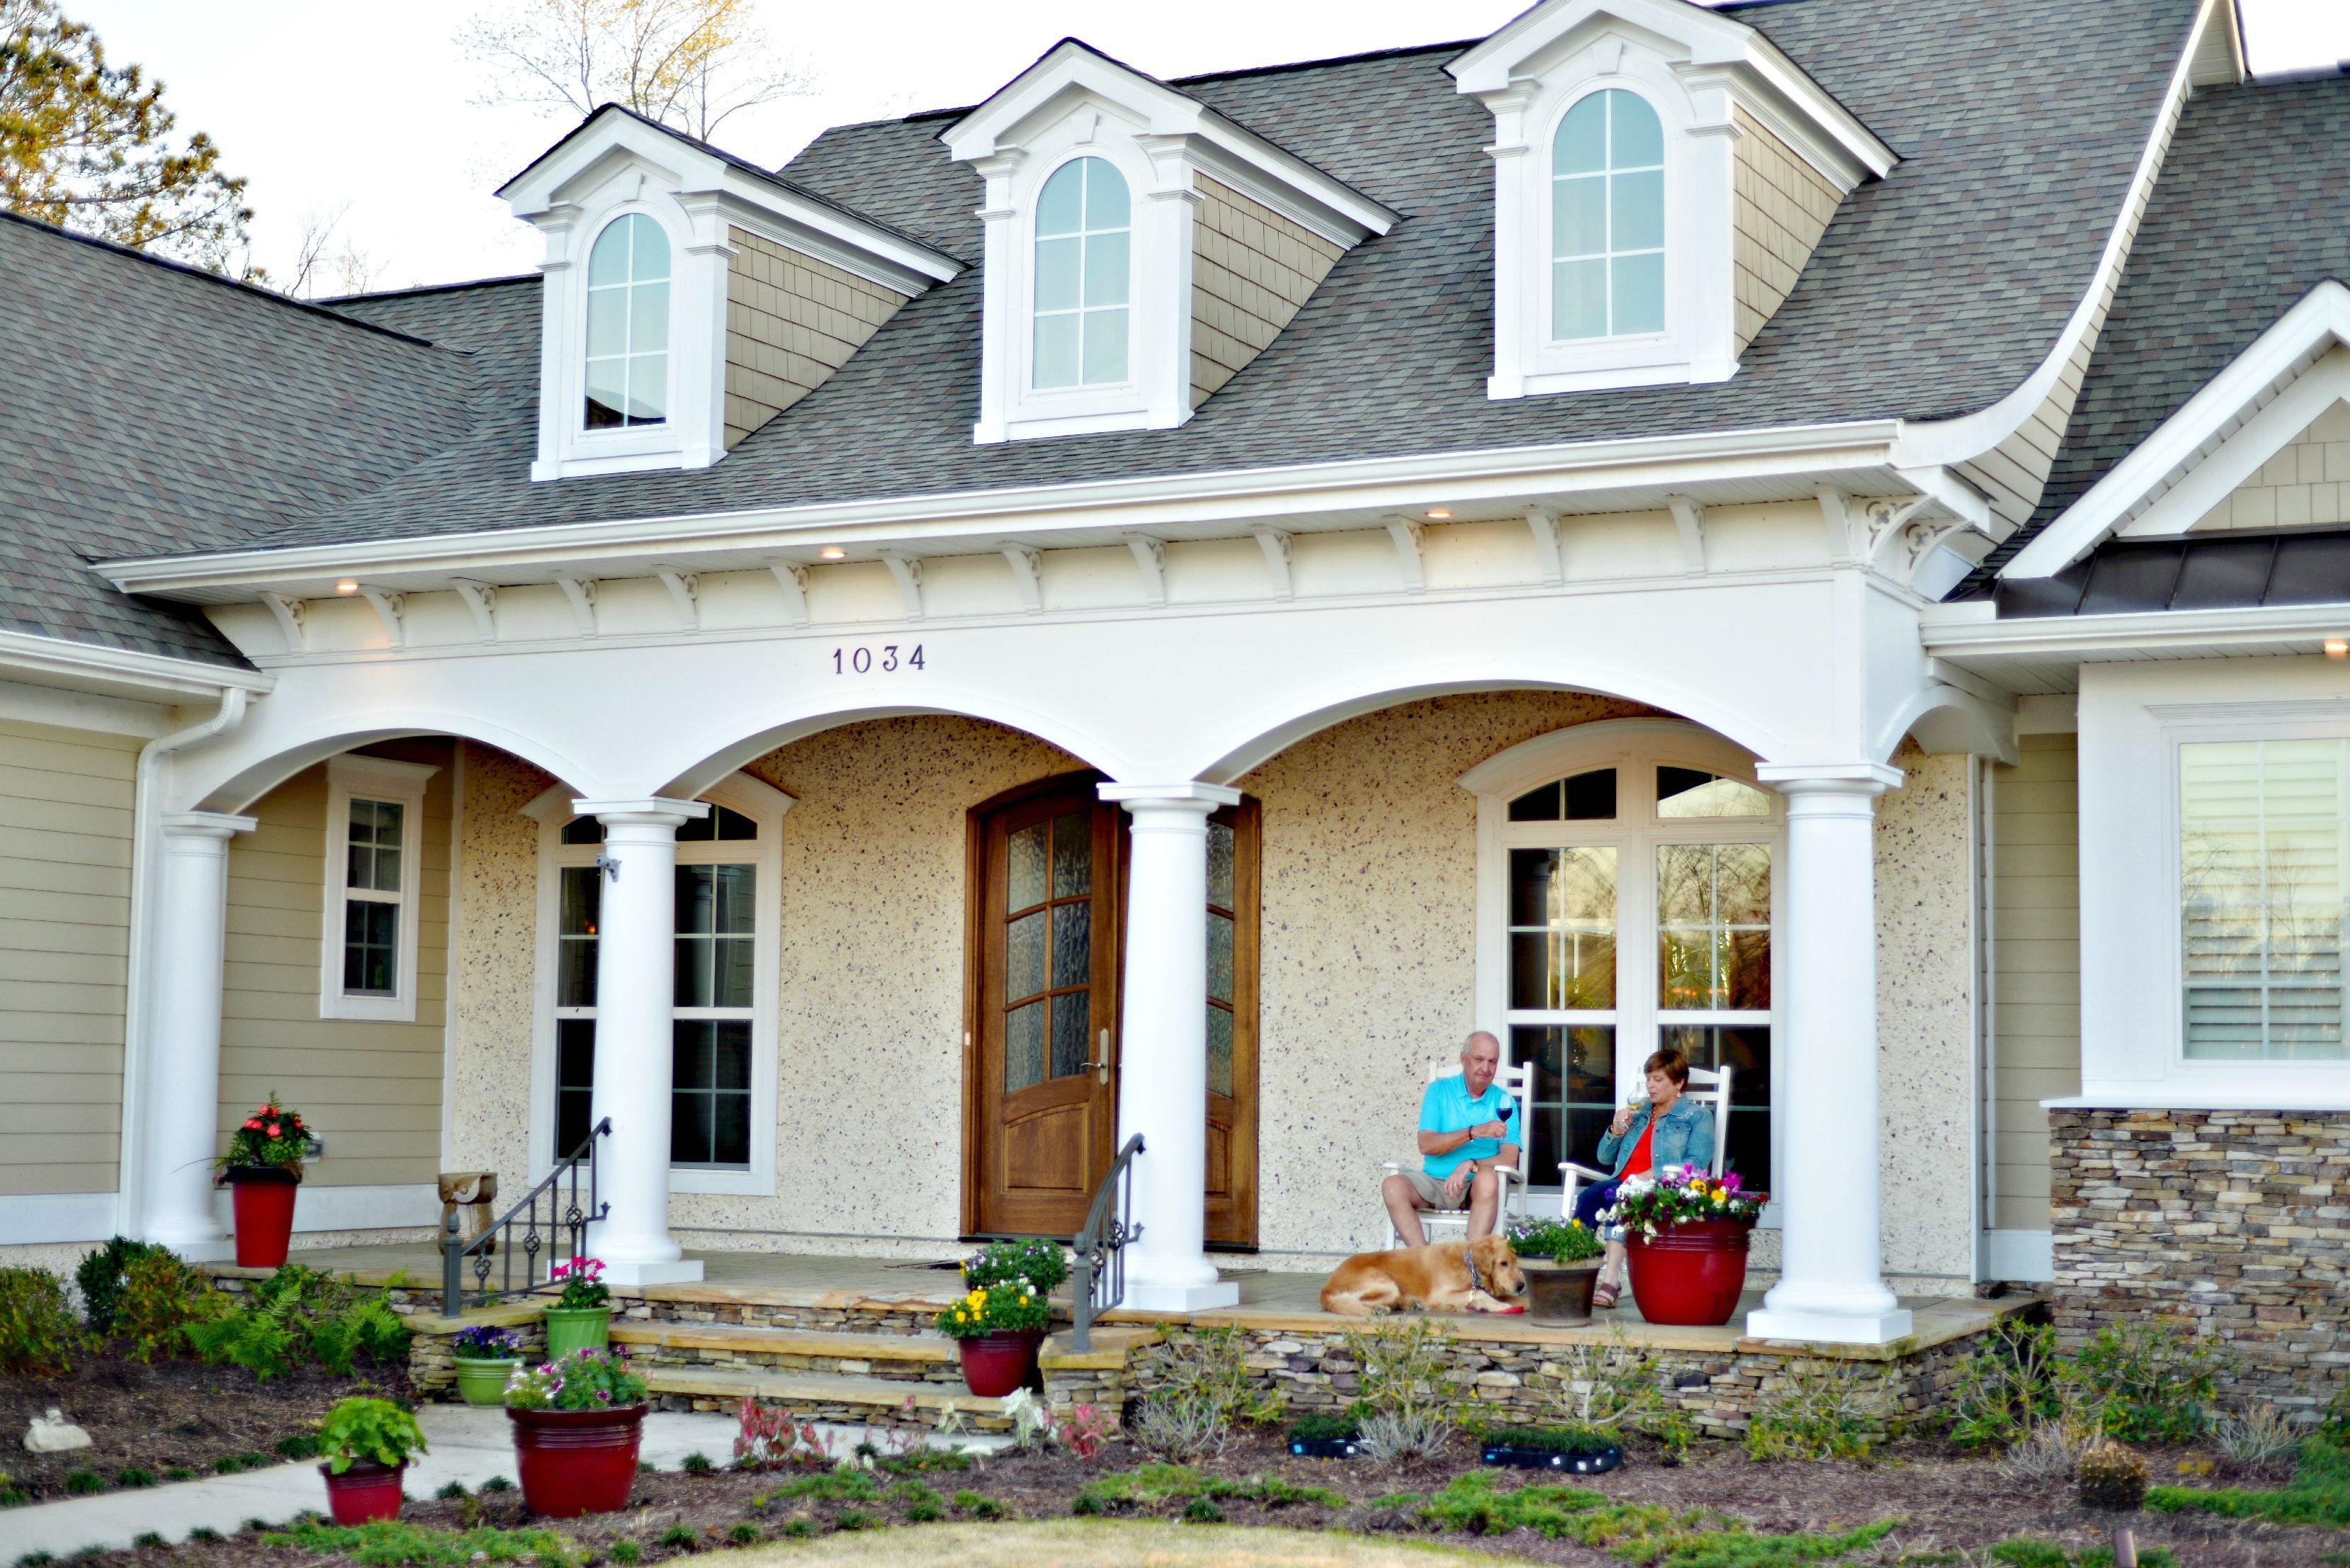 Phenomenal Waterfront New Home Communities In Wilmington Nc Home Interior And Landscaping Analalmasignezvosmurscom